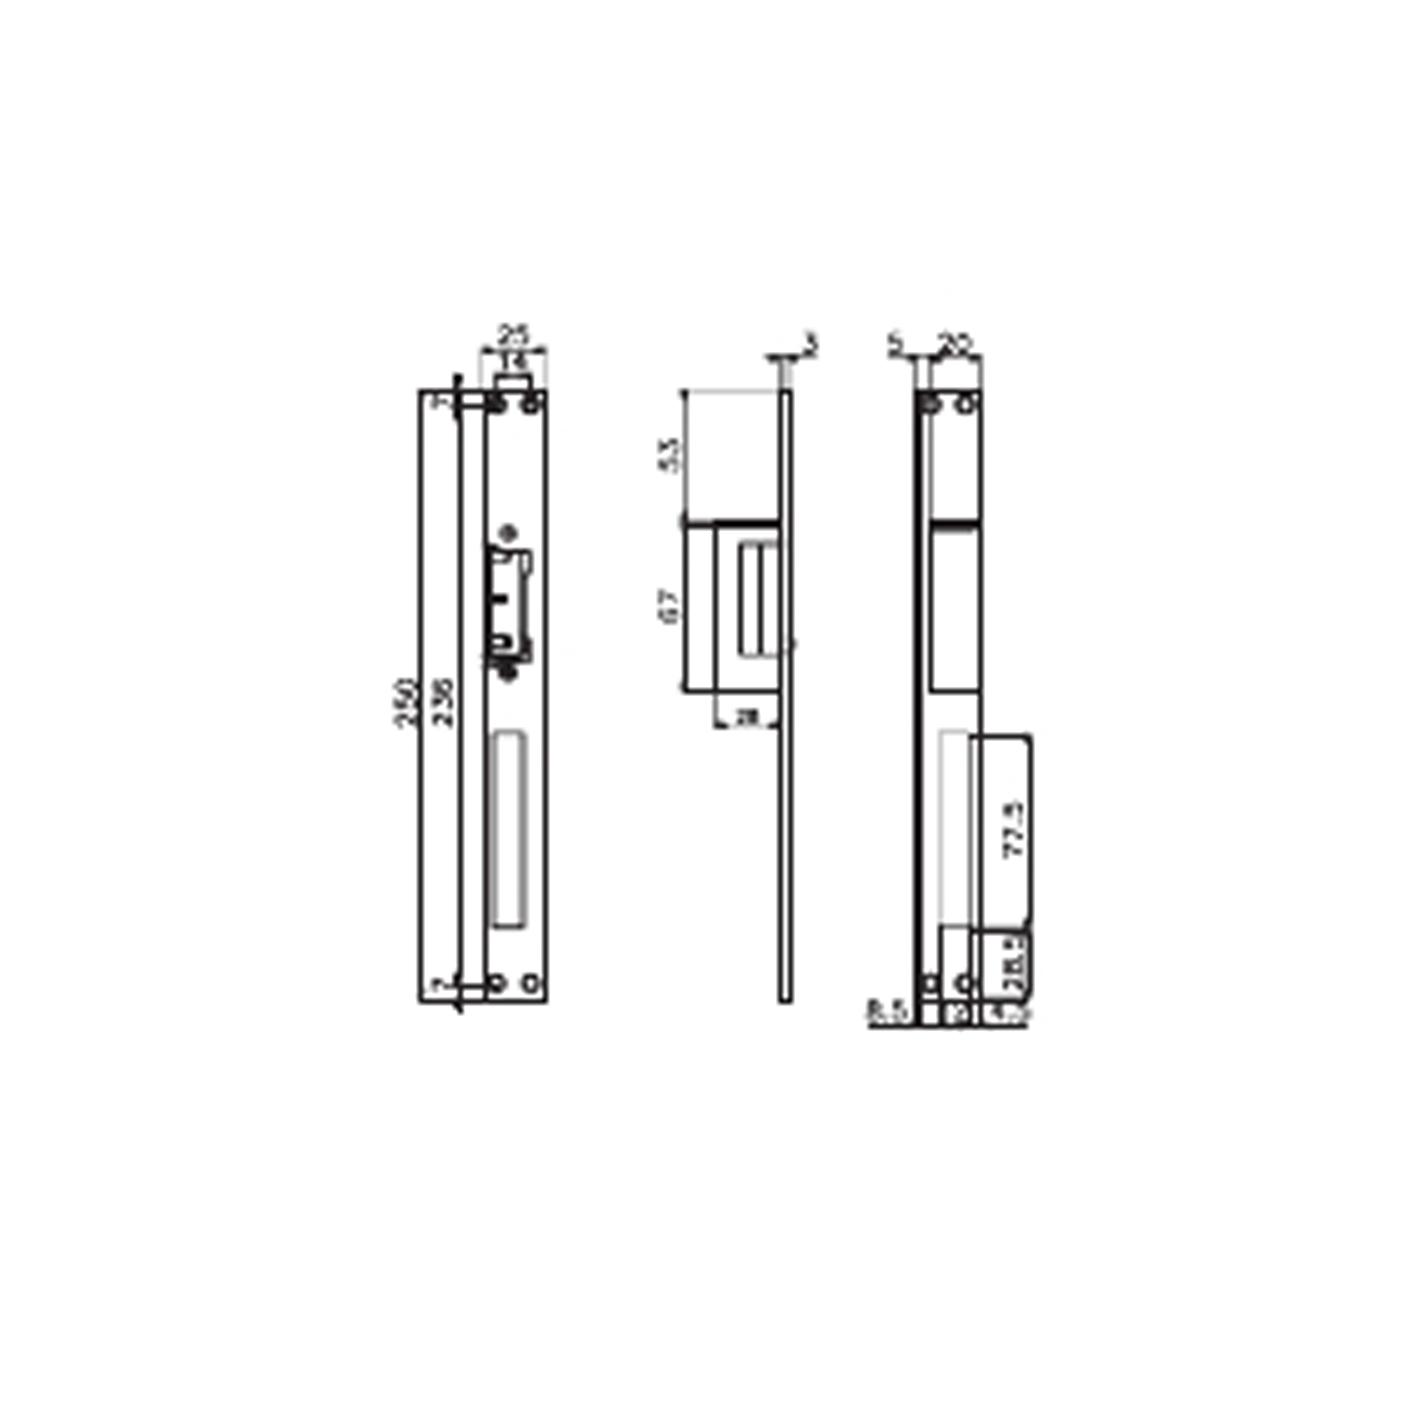 Kale KD012/20-222 Gizli Kapı Otomatiği